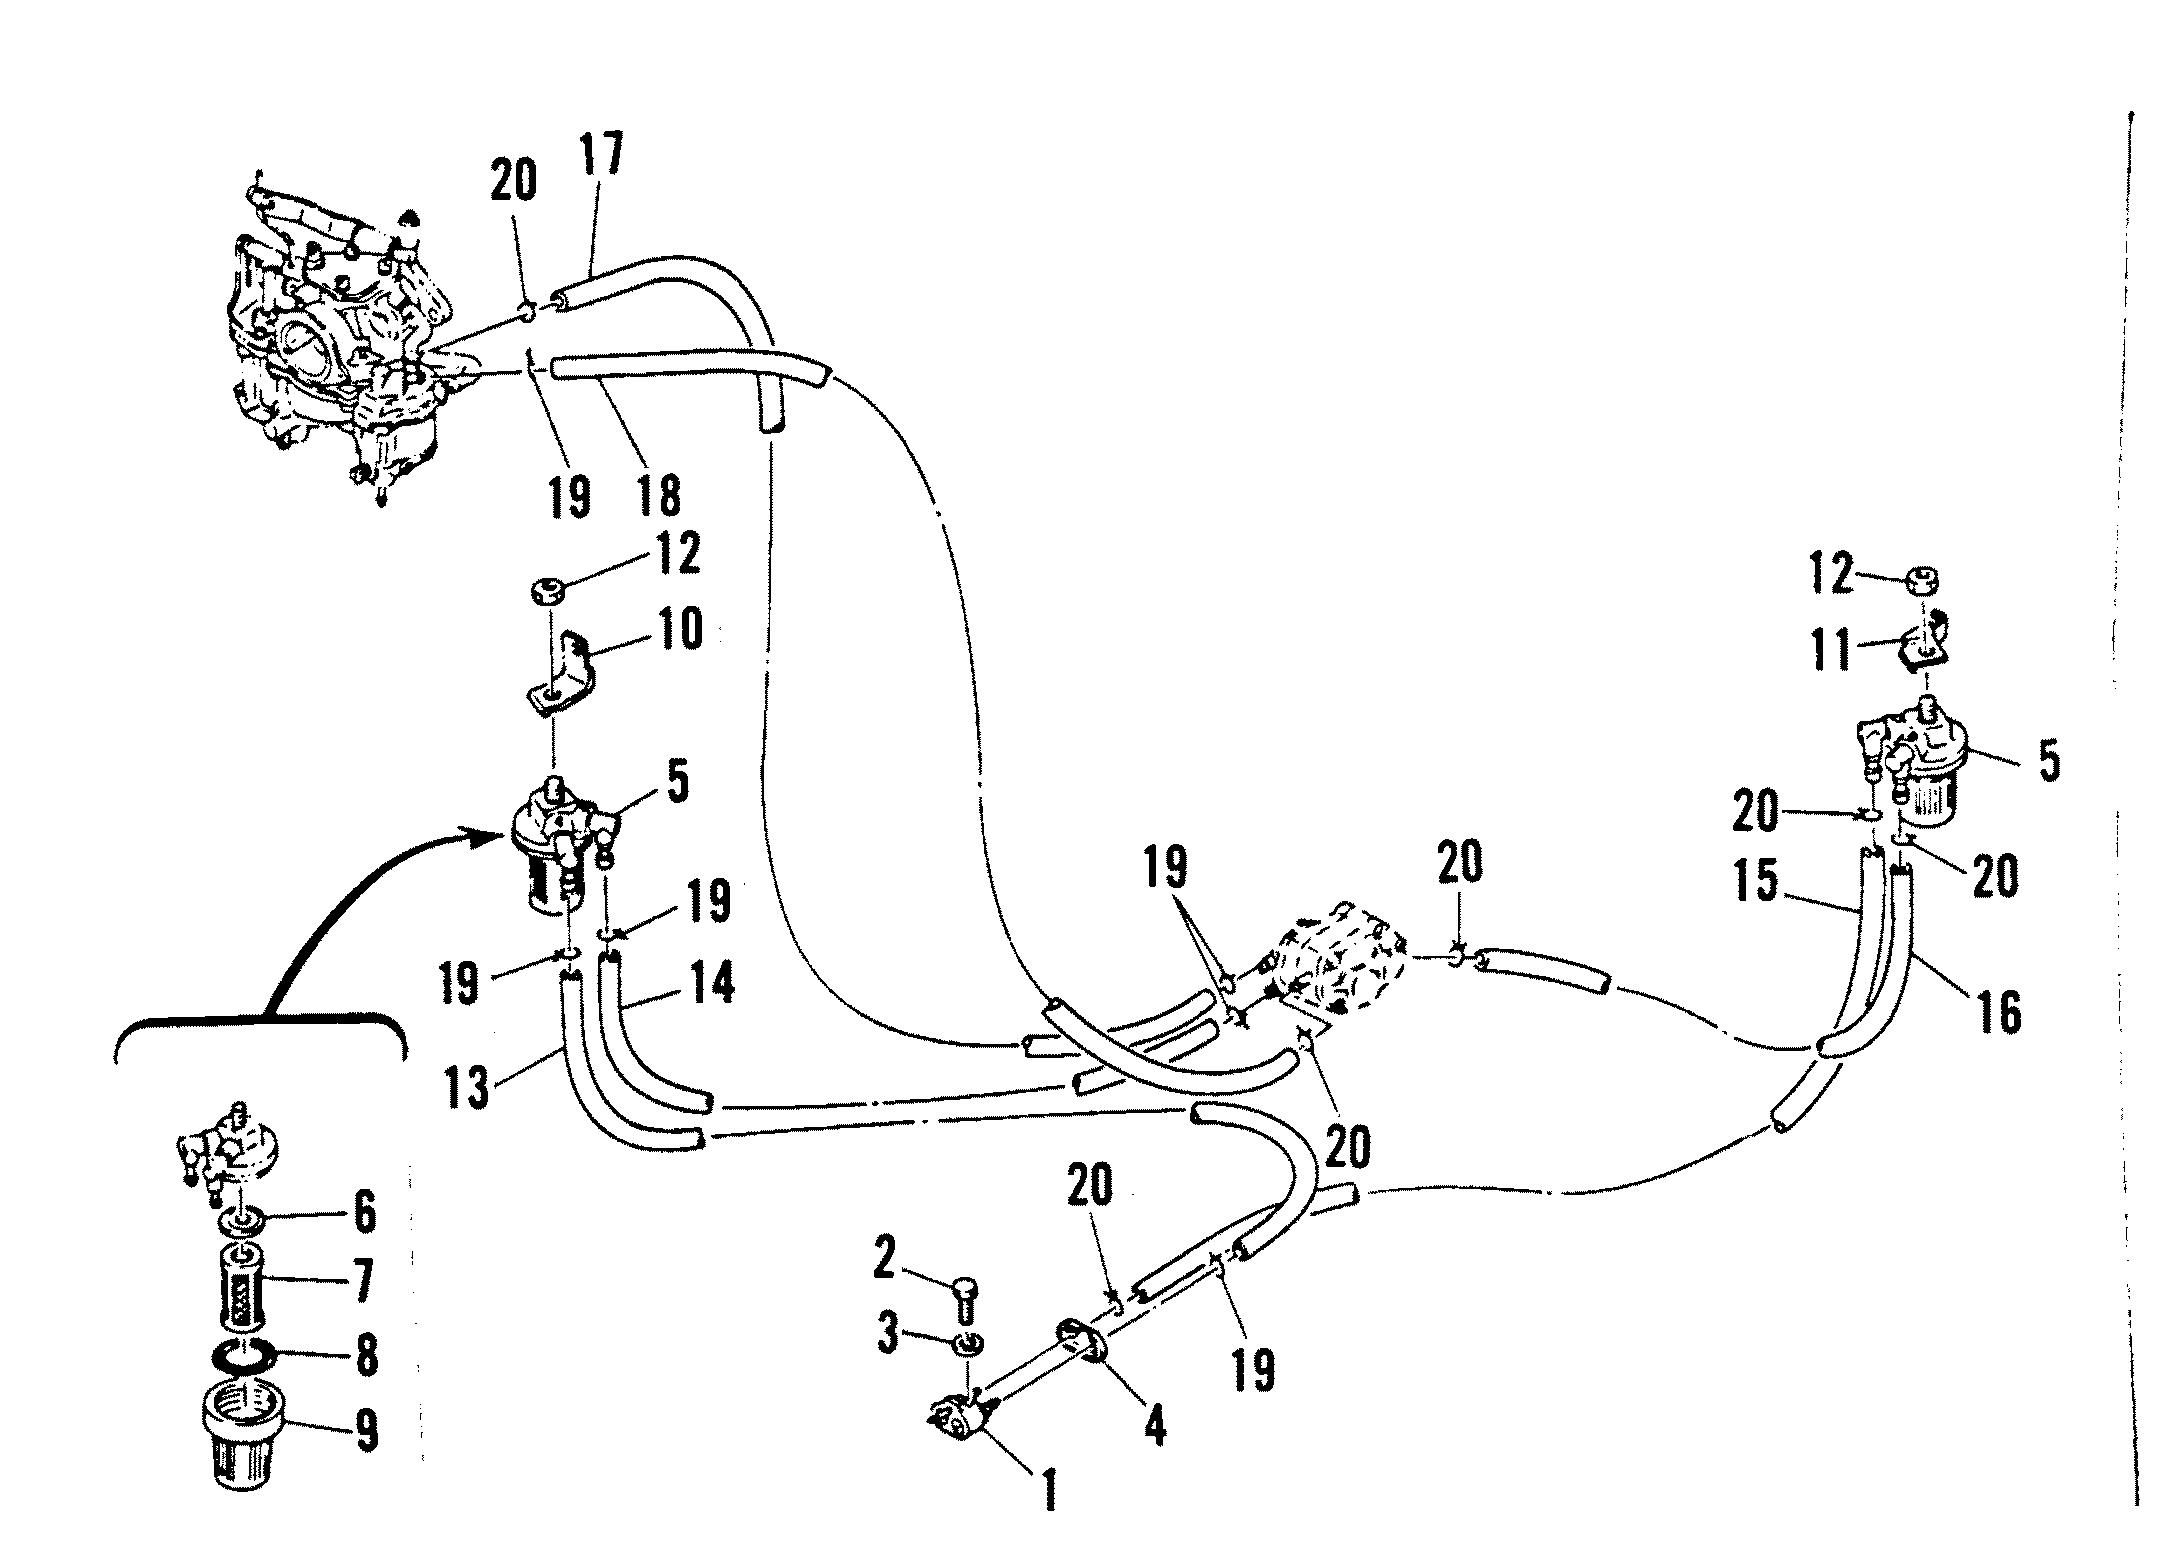 Каталог запчастей MARINER K25 6A4-300101 AND UP (ML